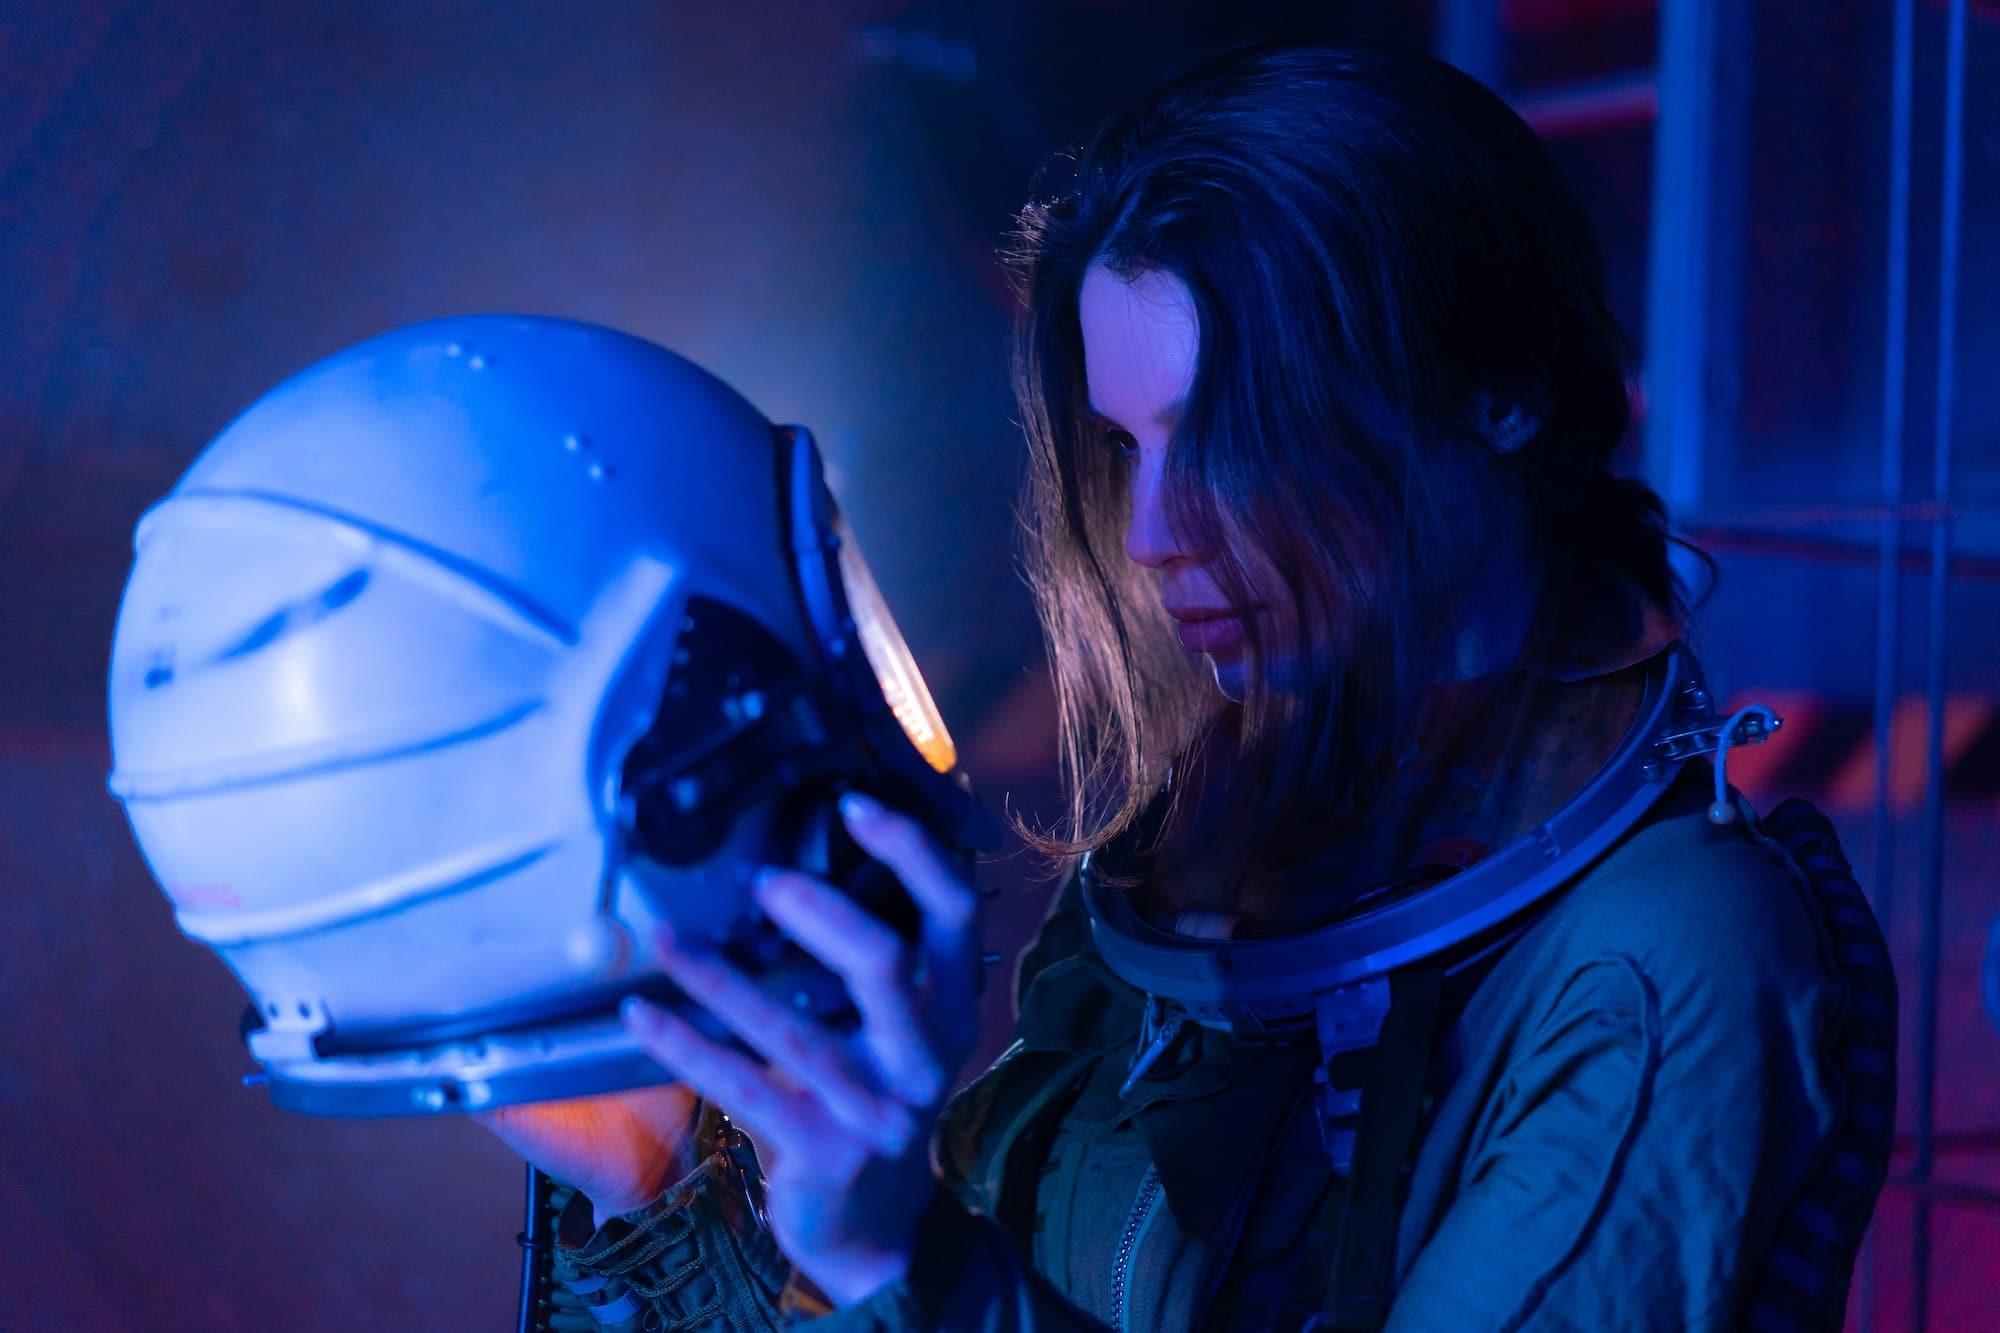 Female astronaut looking into helmet blue light truth